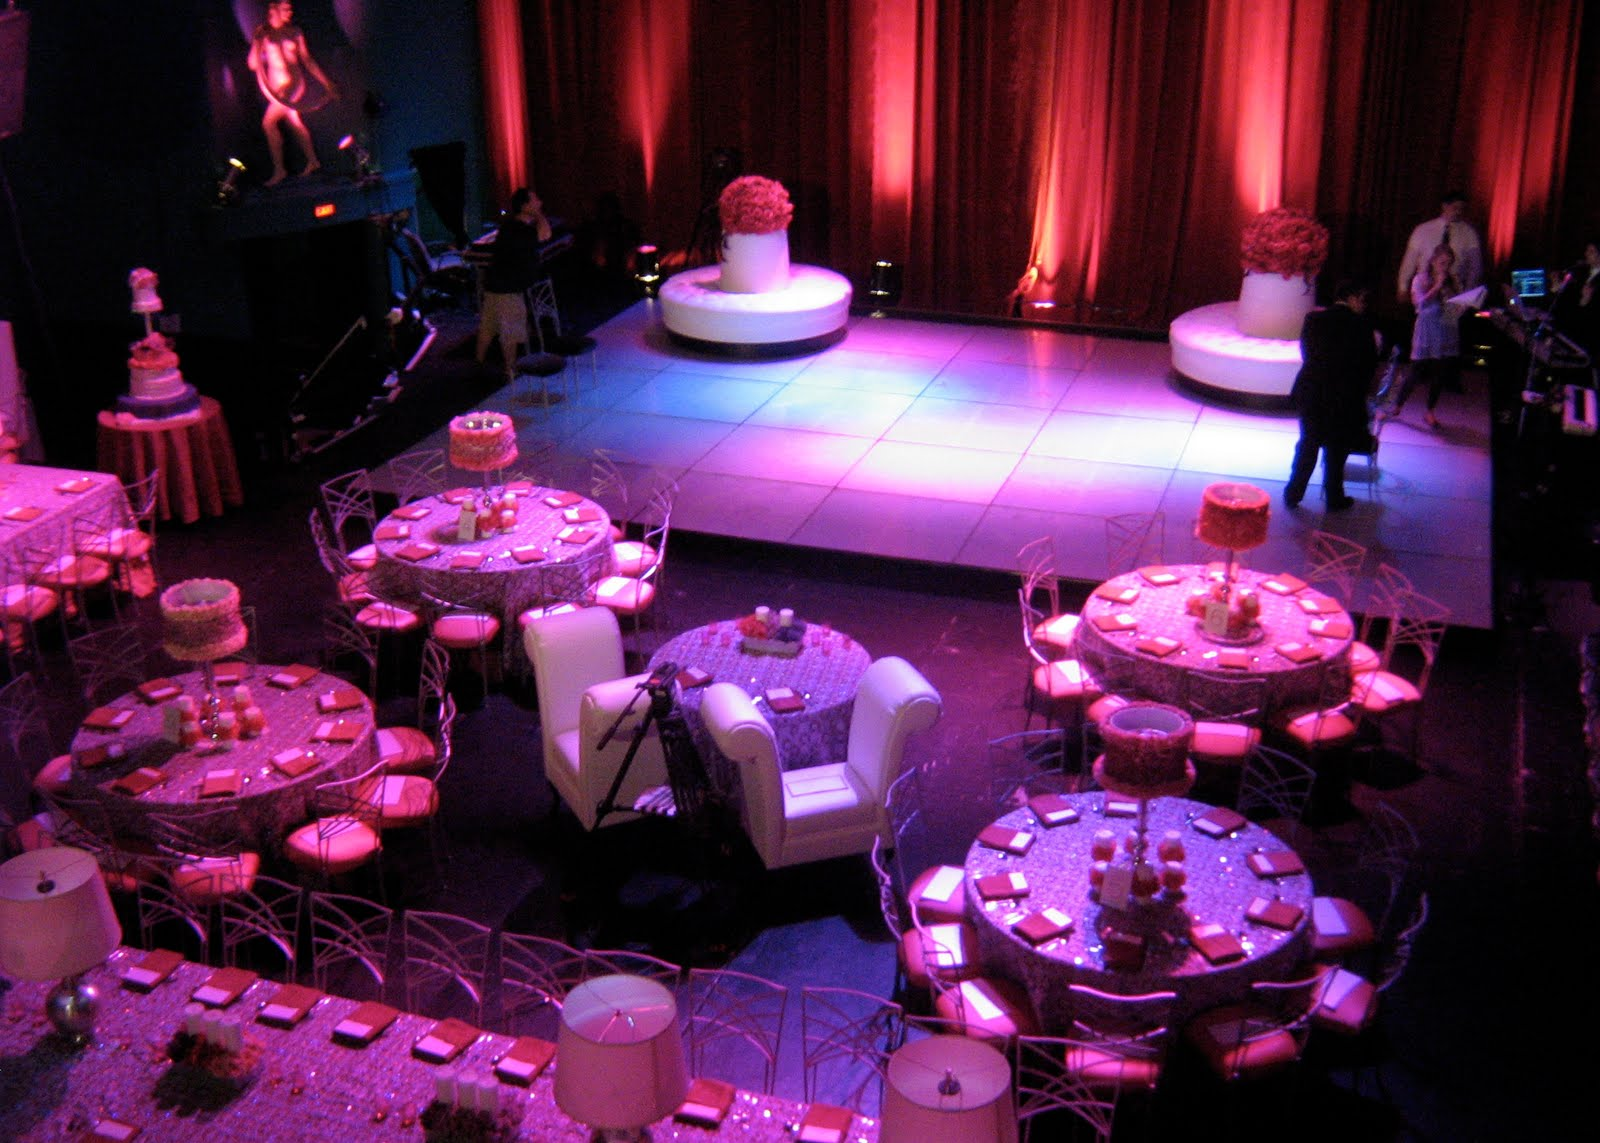 sublime bakery wedding cake for my fair wedding with david tutera